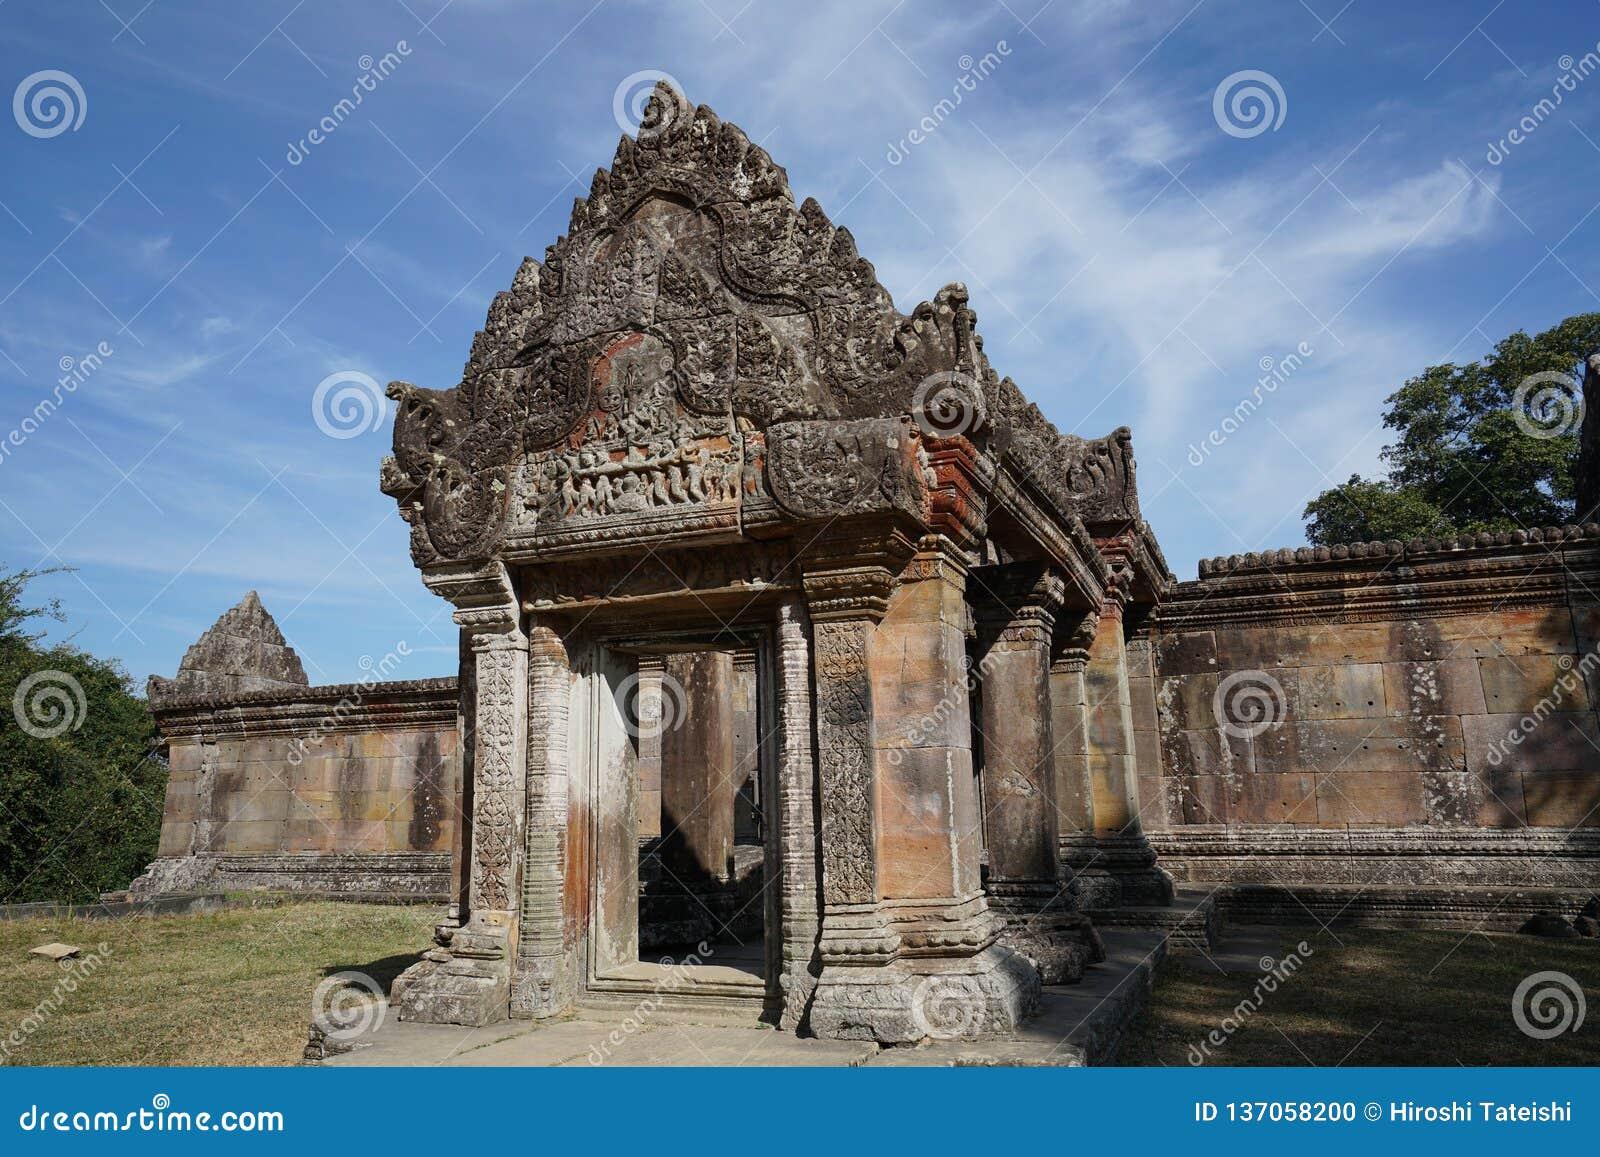 Third Gopura Of Preah Vihear Temple, Cambodia Stock Photo - Image of